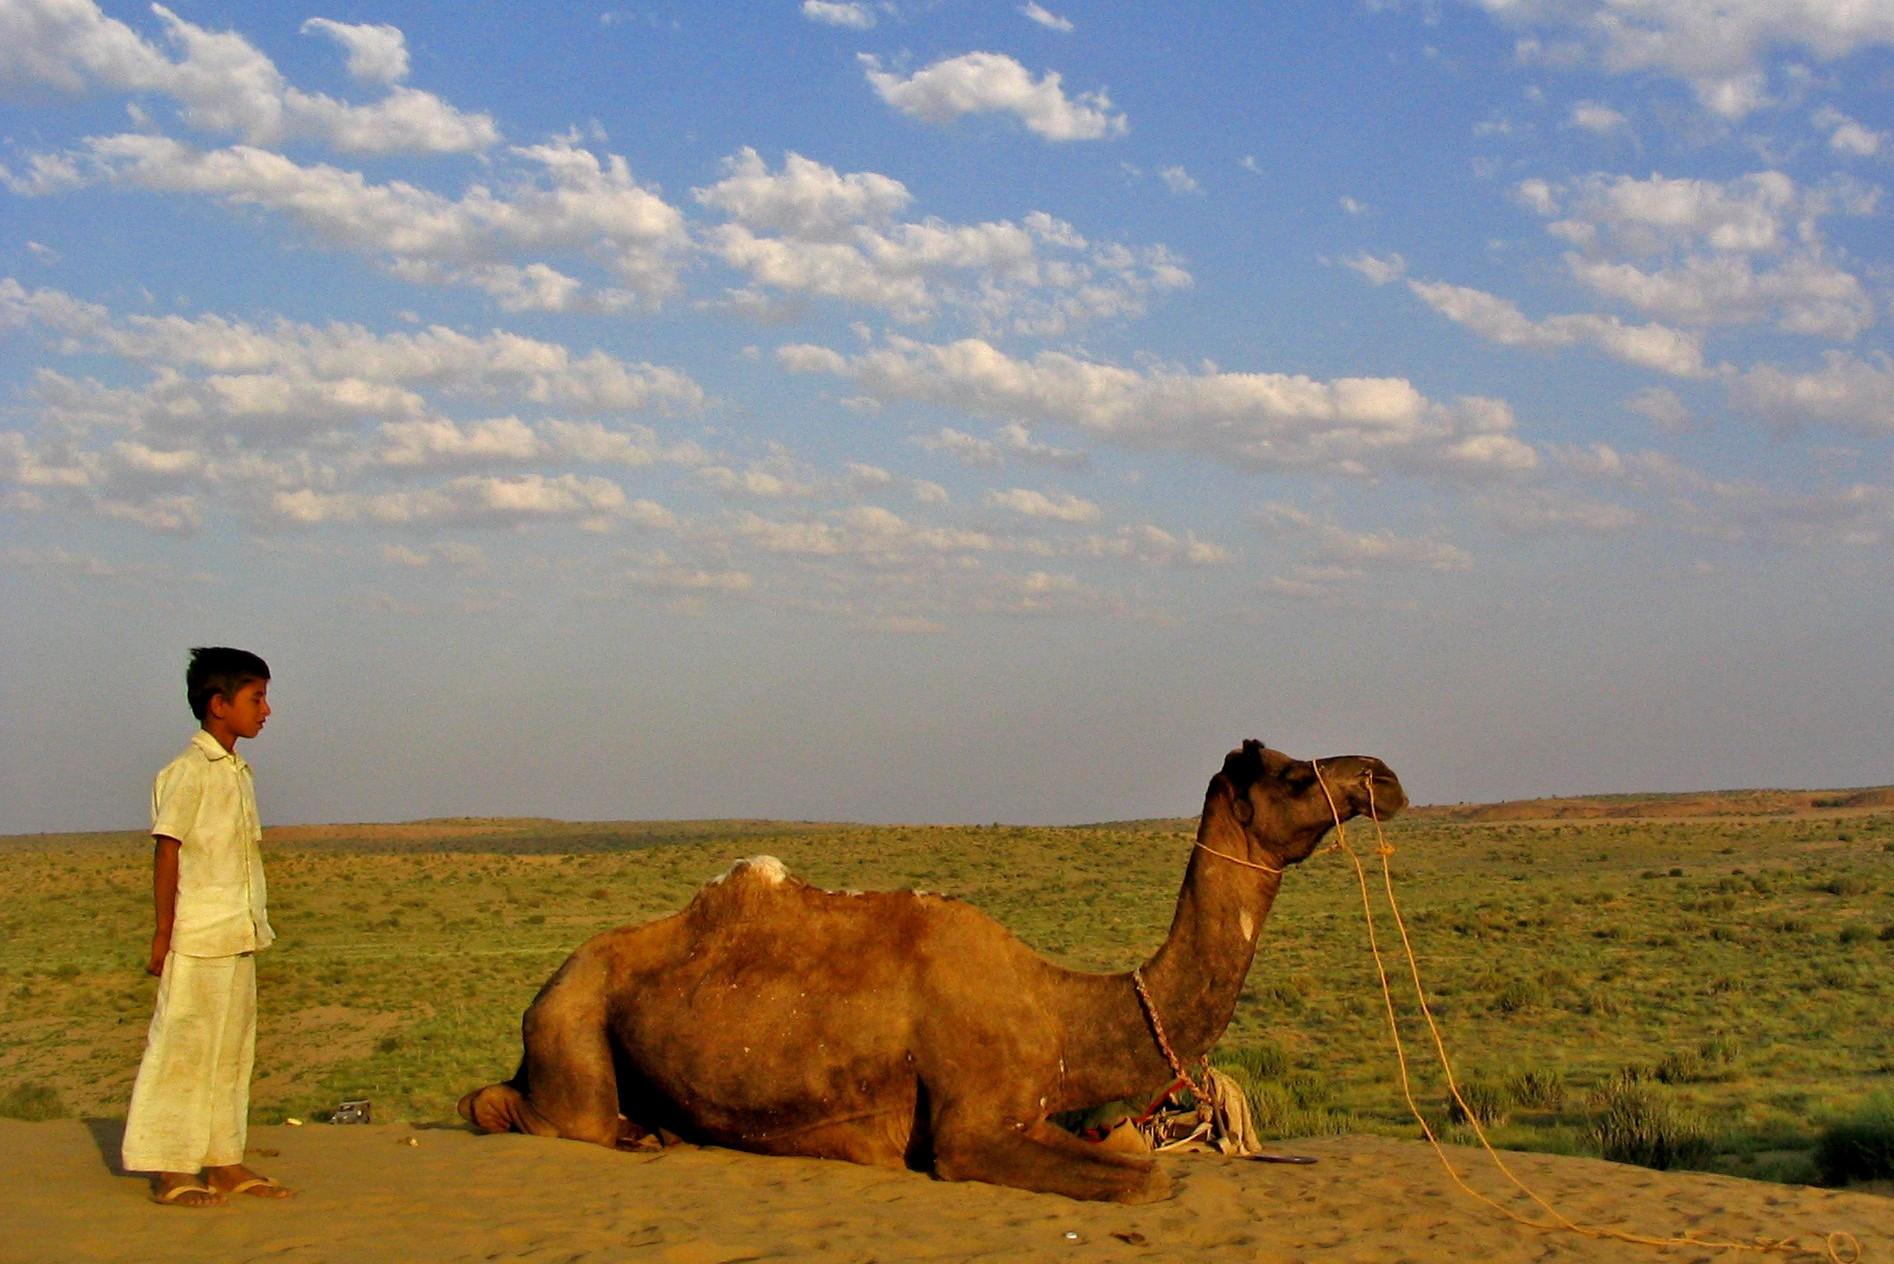 India desert camel trip